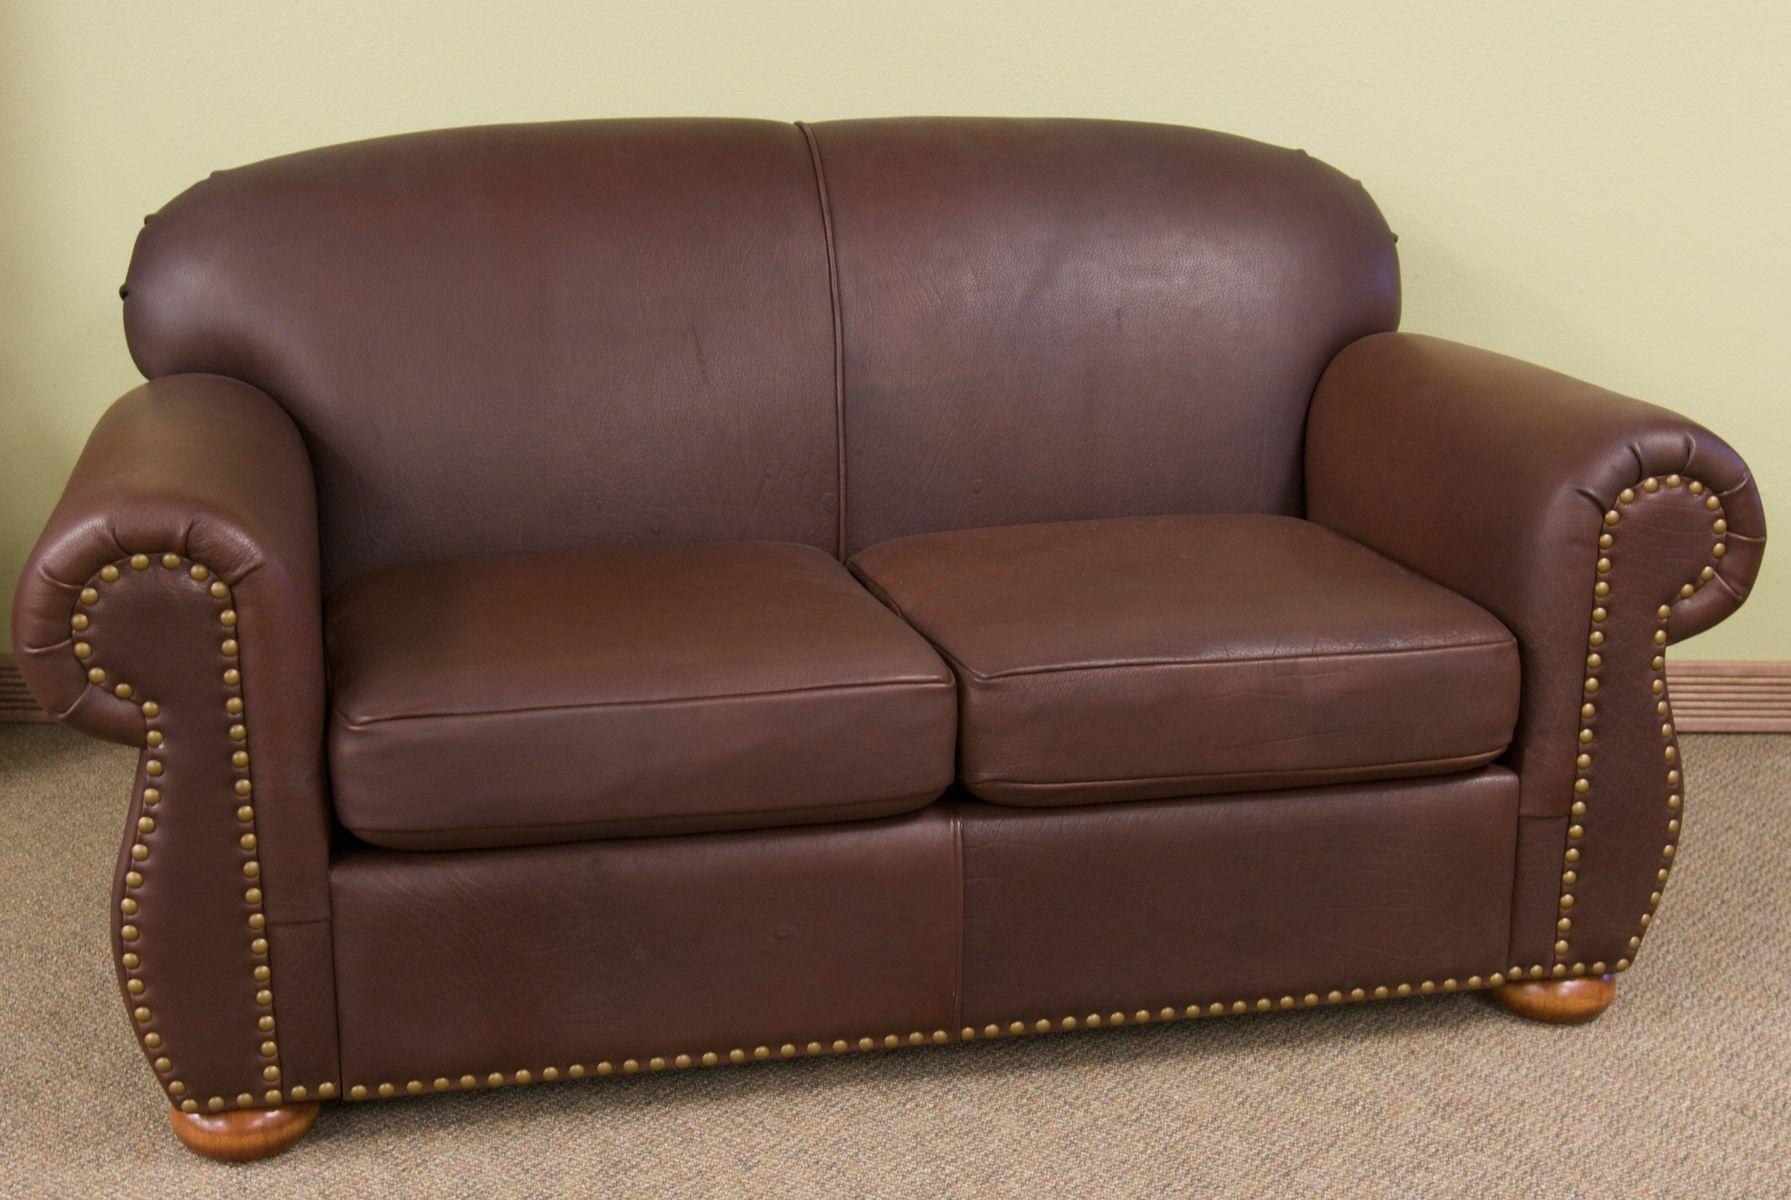 Magnificent Custom Leather Loveseat By Dakota Bison Furniture Ibusinesslaw Wood Chair Design Ideas Ibusinesslaworg